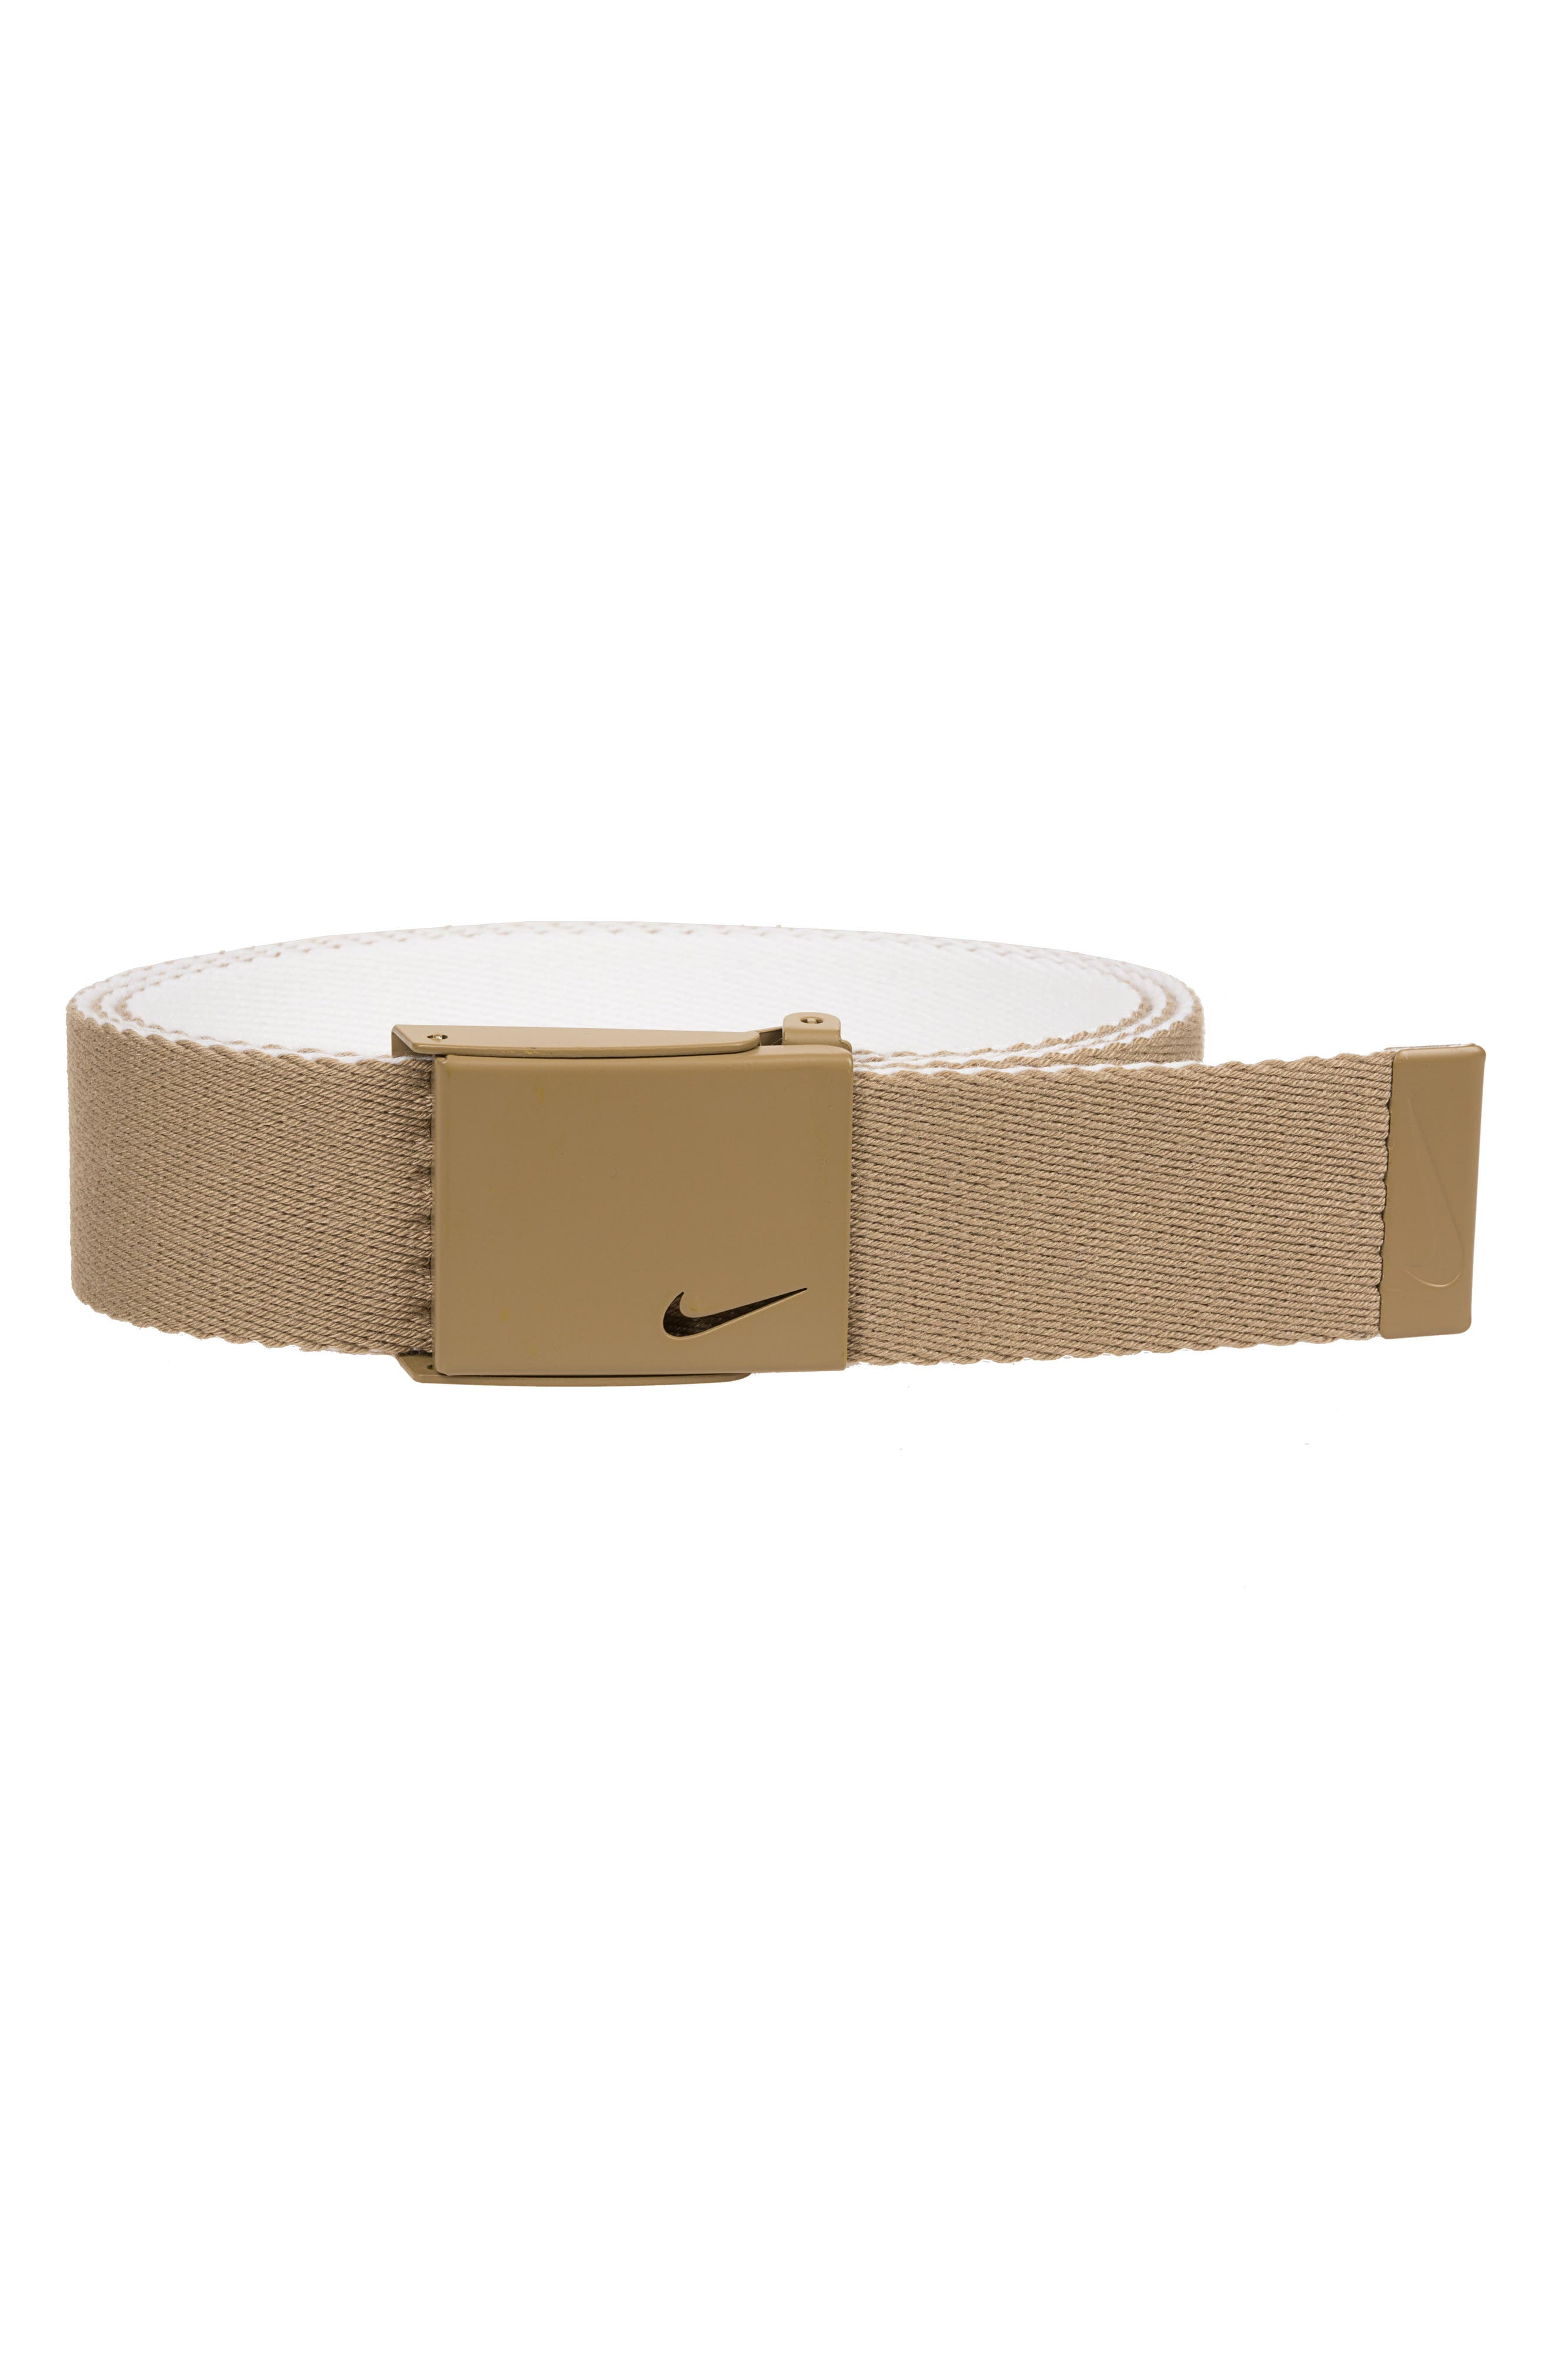 Nike Essentials Reversible Webbed Belt